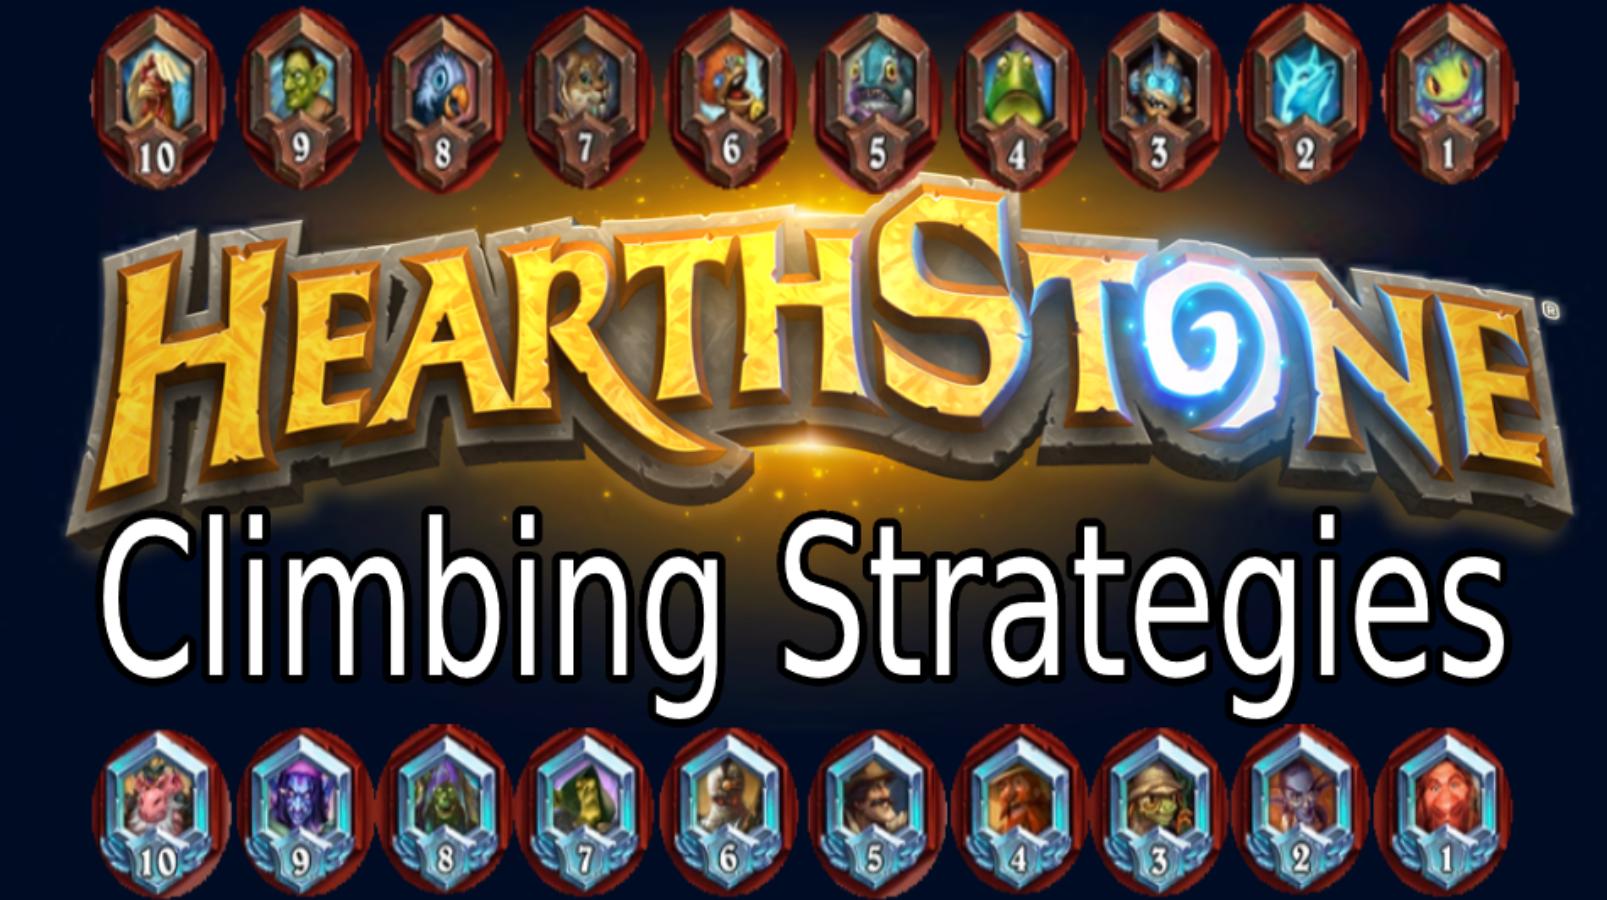 Hearthstone Climbing Strategies